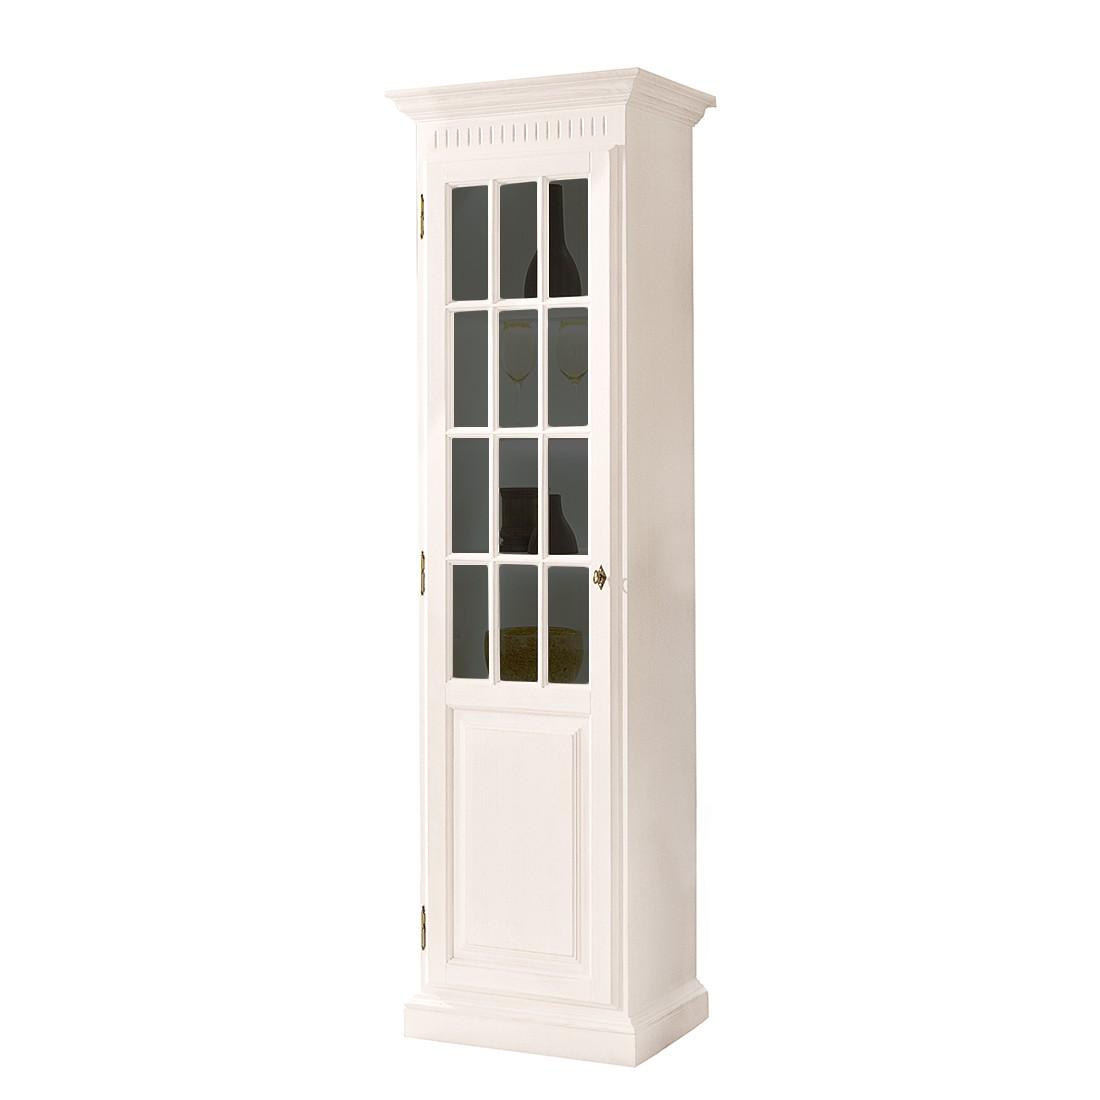 Armoire vitrine La Carlotta III - Pin massif - Crème - Sans éclairage, Ridgevalley